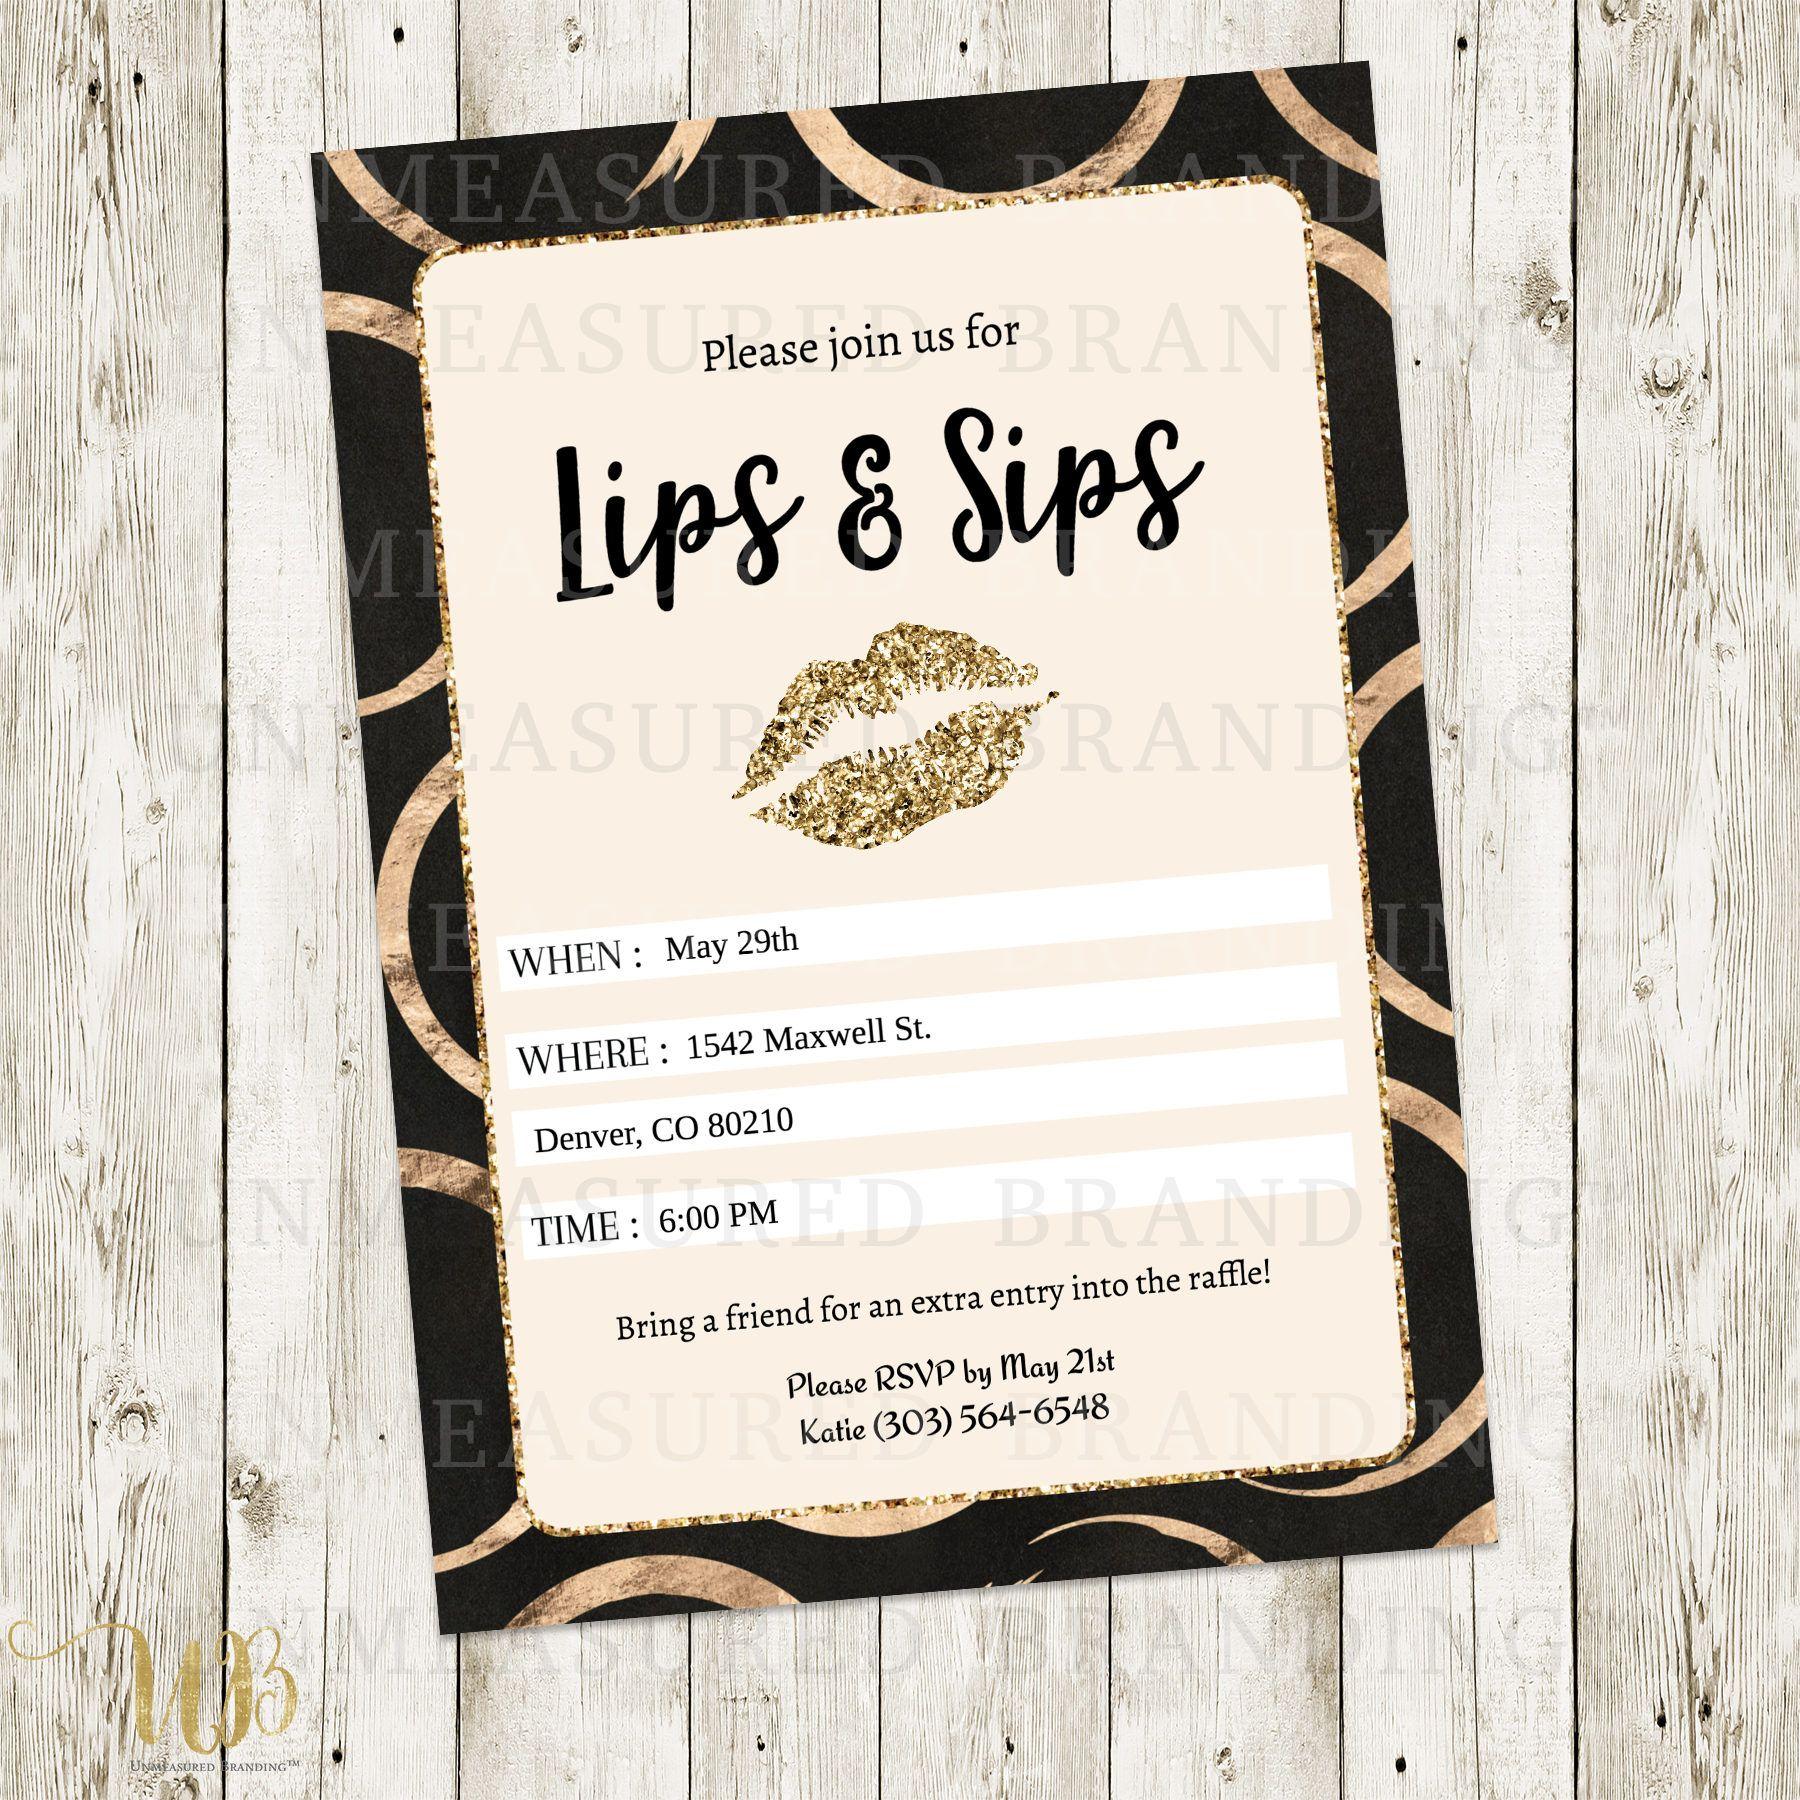 LipSense Business Party Invitation | LIPSENSE & MAKEUP | Pinterest ...